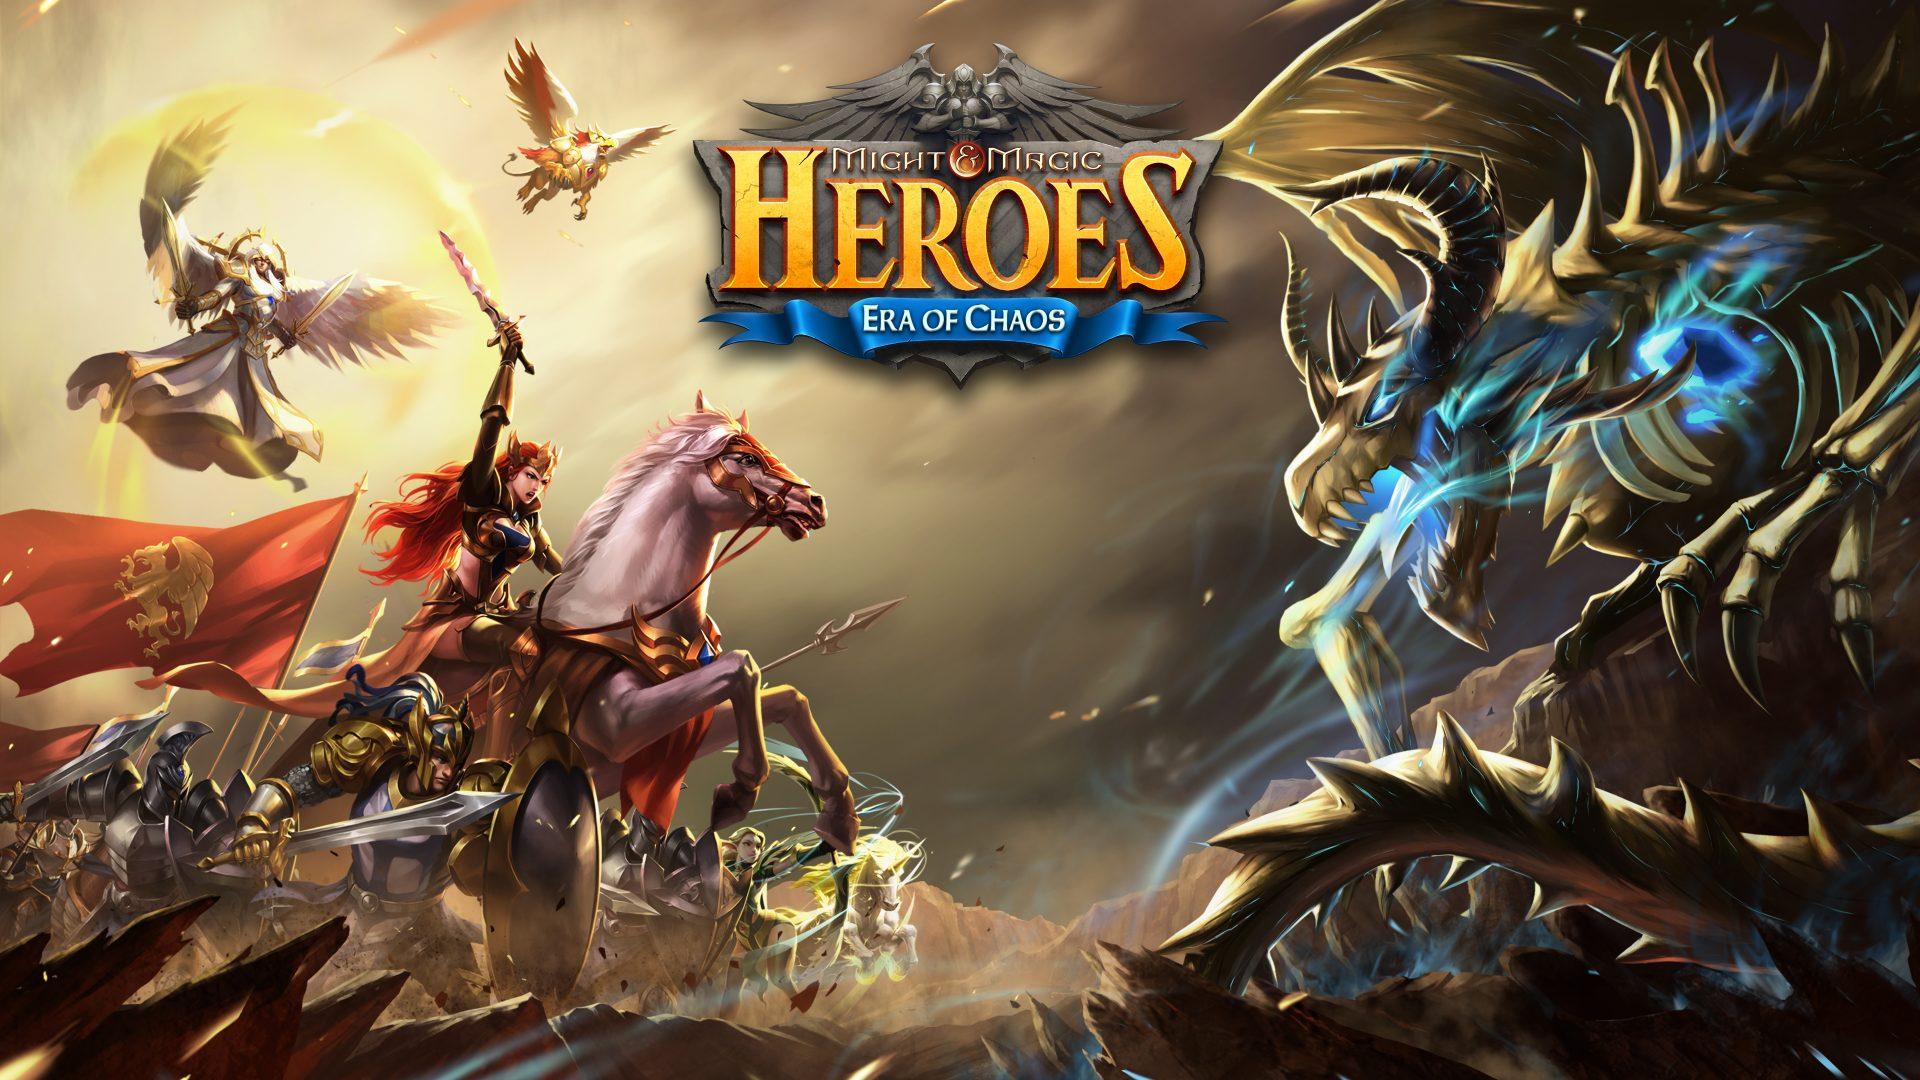 Might & Magic Heroes Era of Chaos